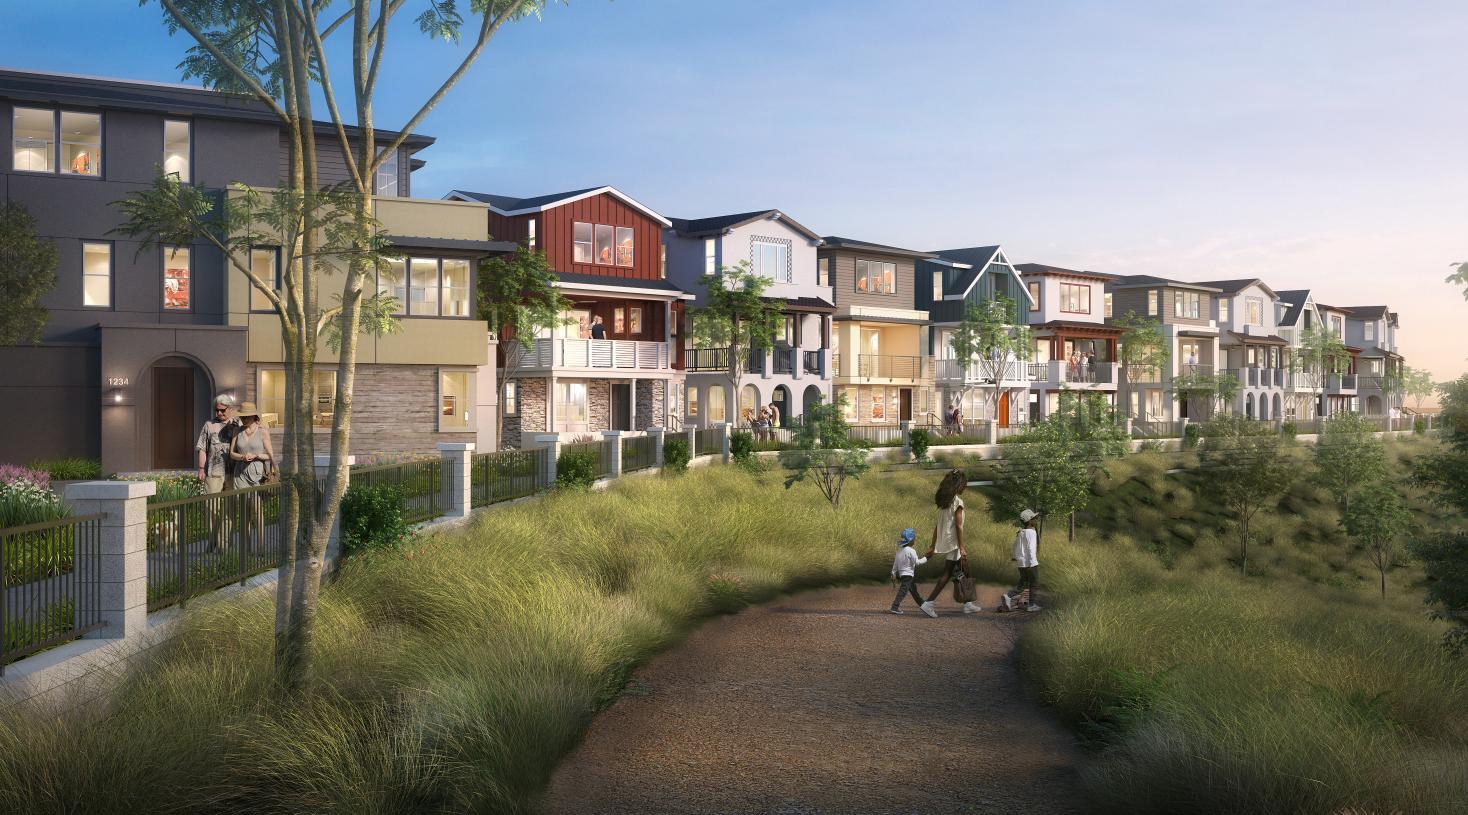 Community Promenade provides walking paths